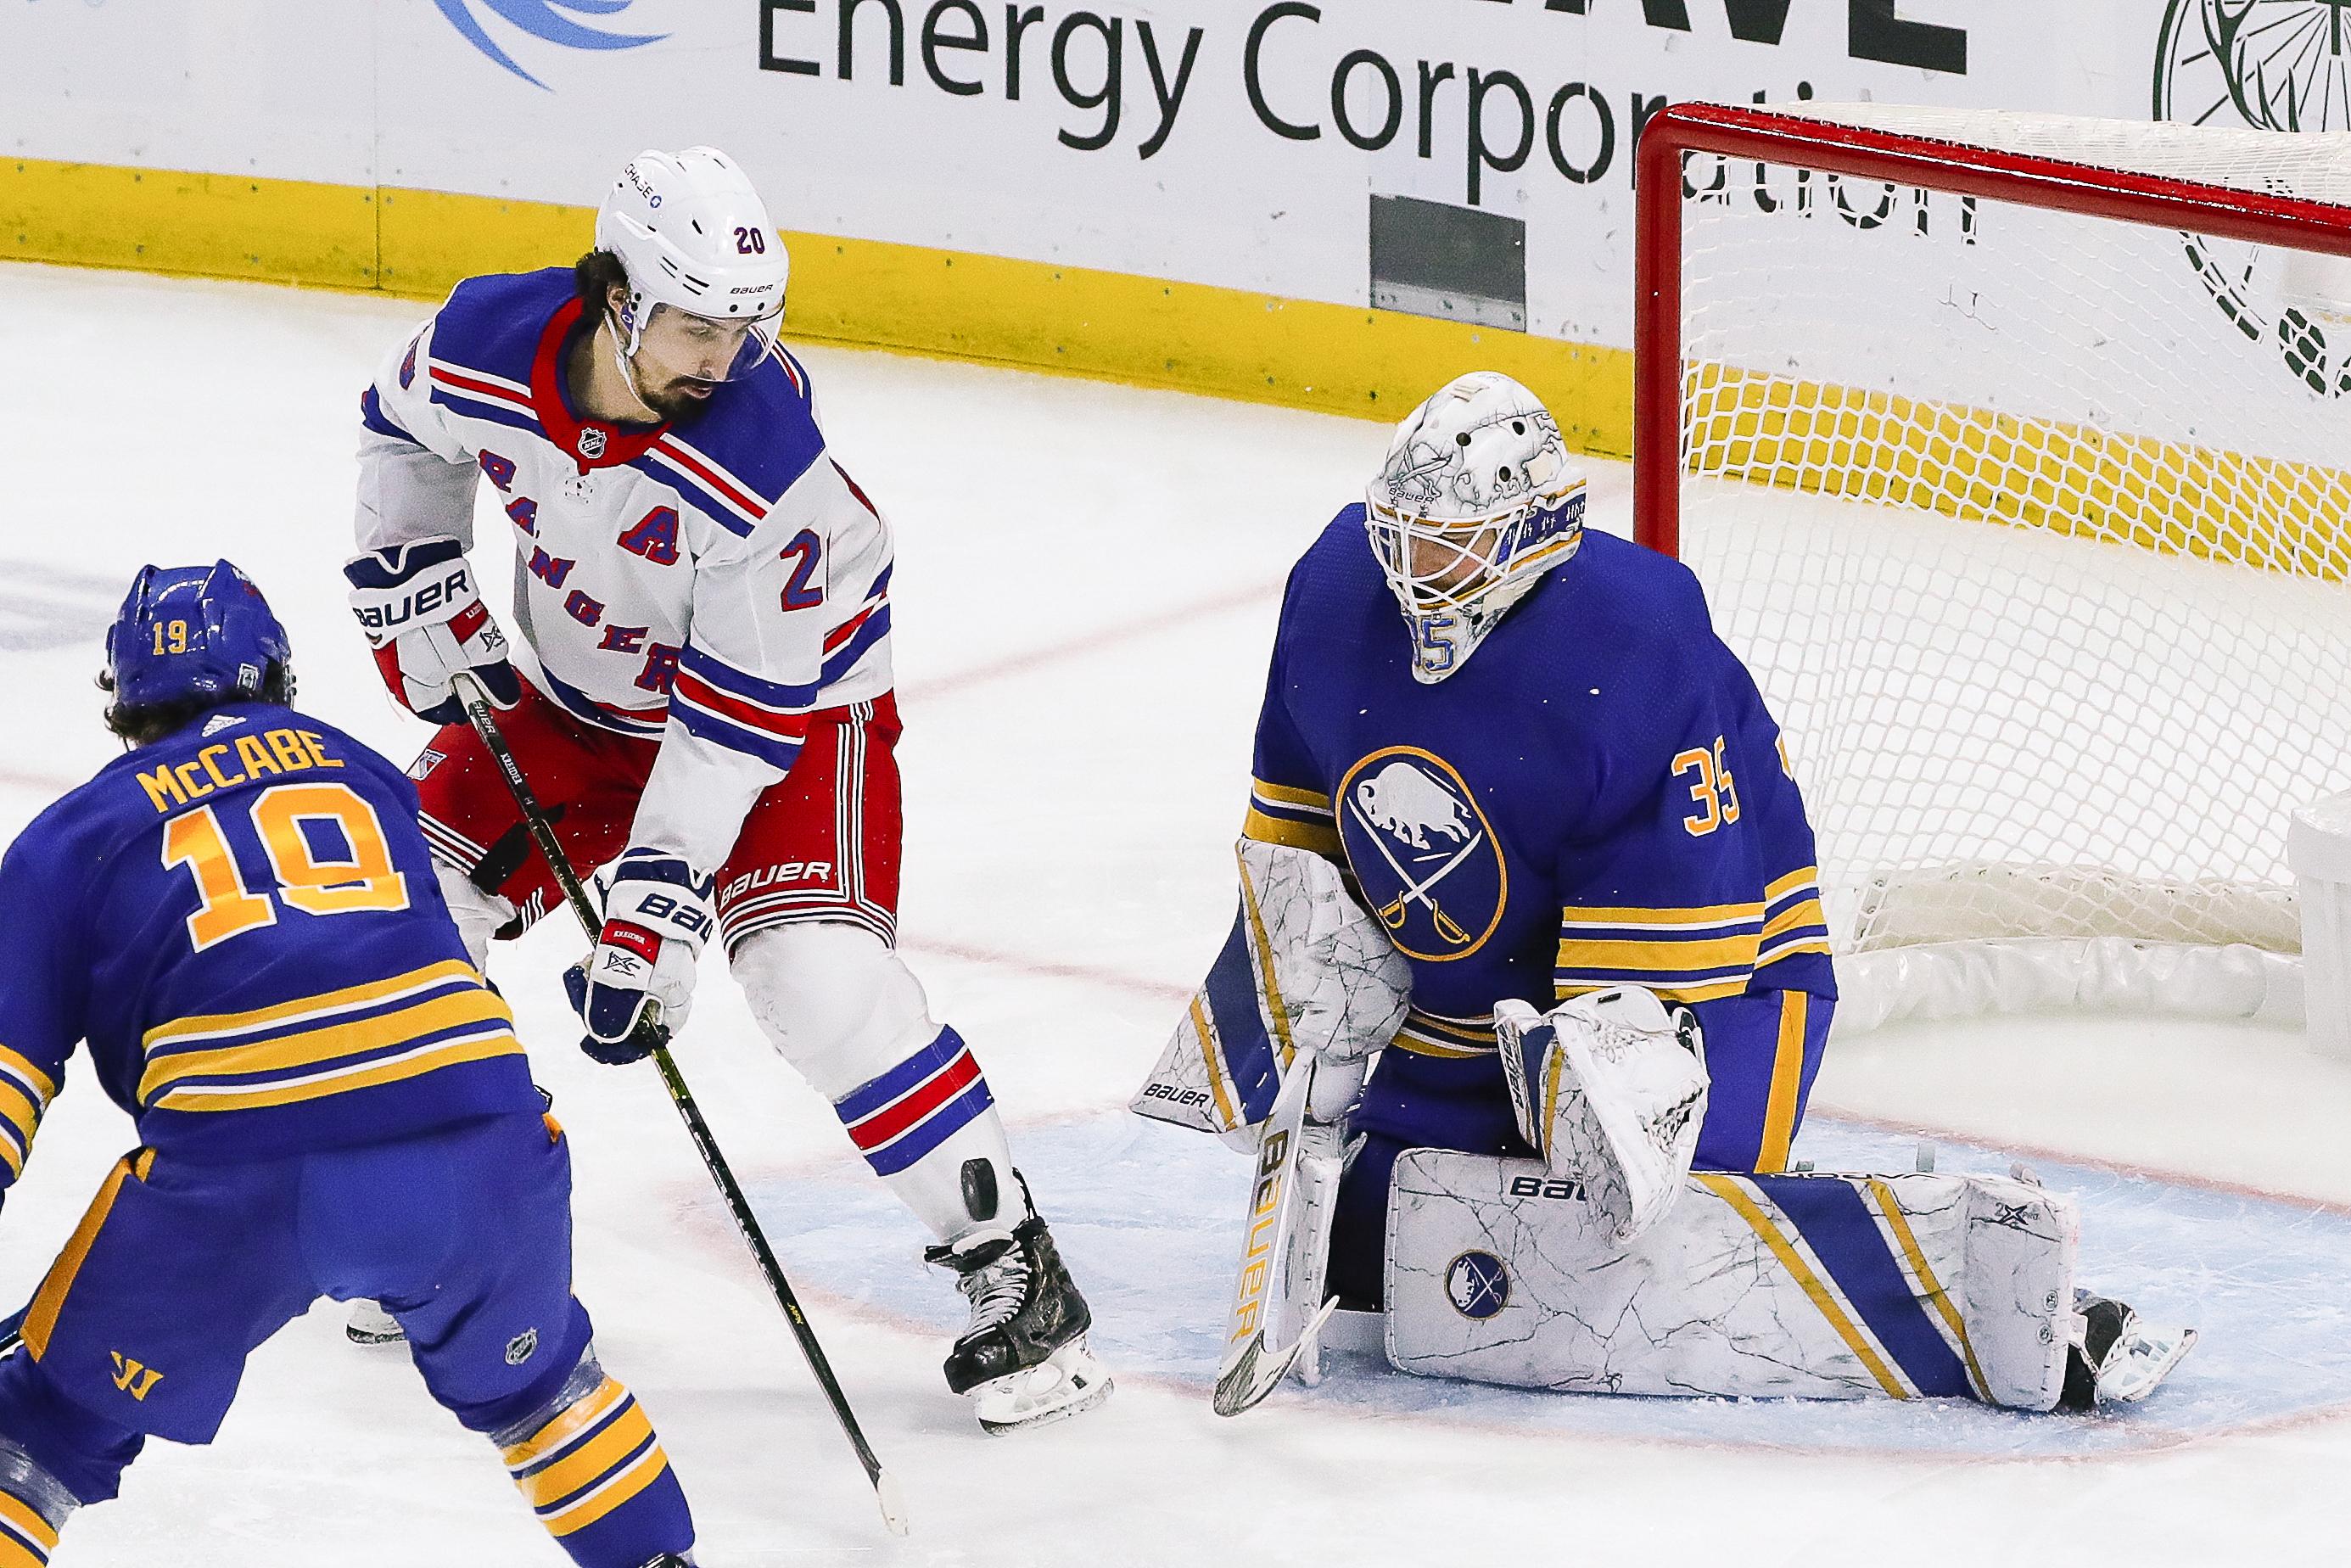 NHL: JAN 26 Rangers at Sabres